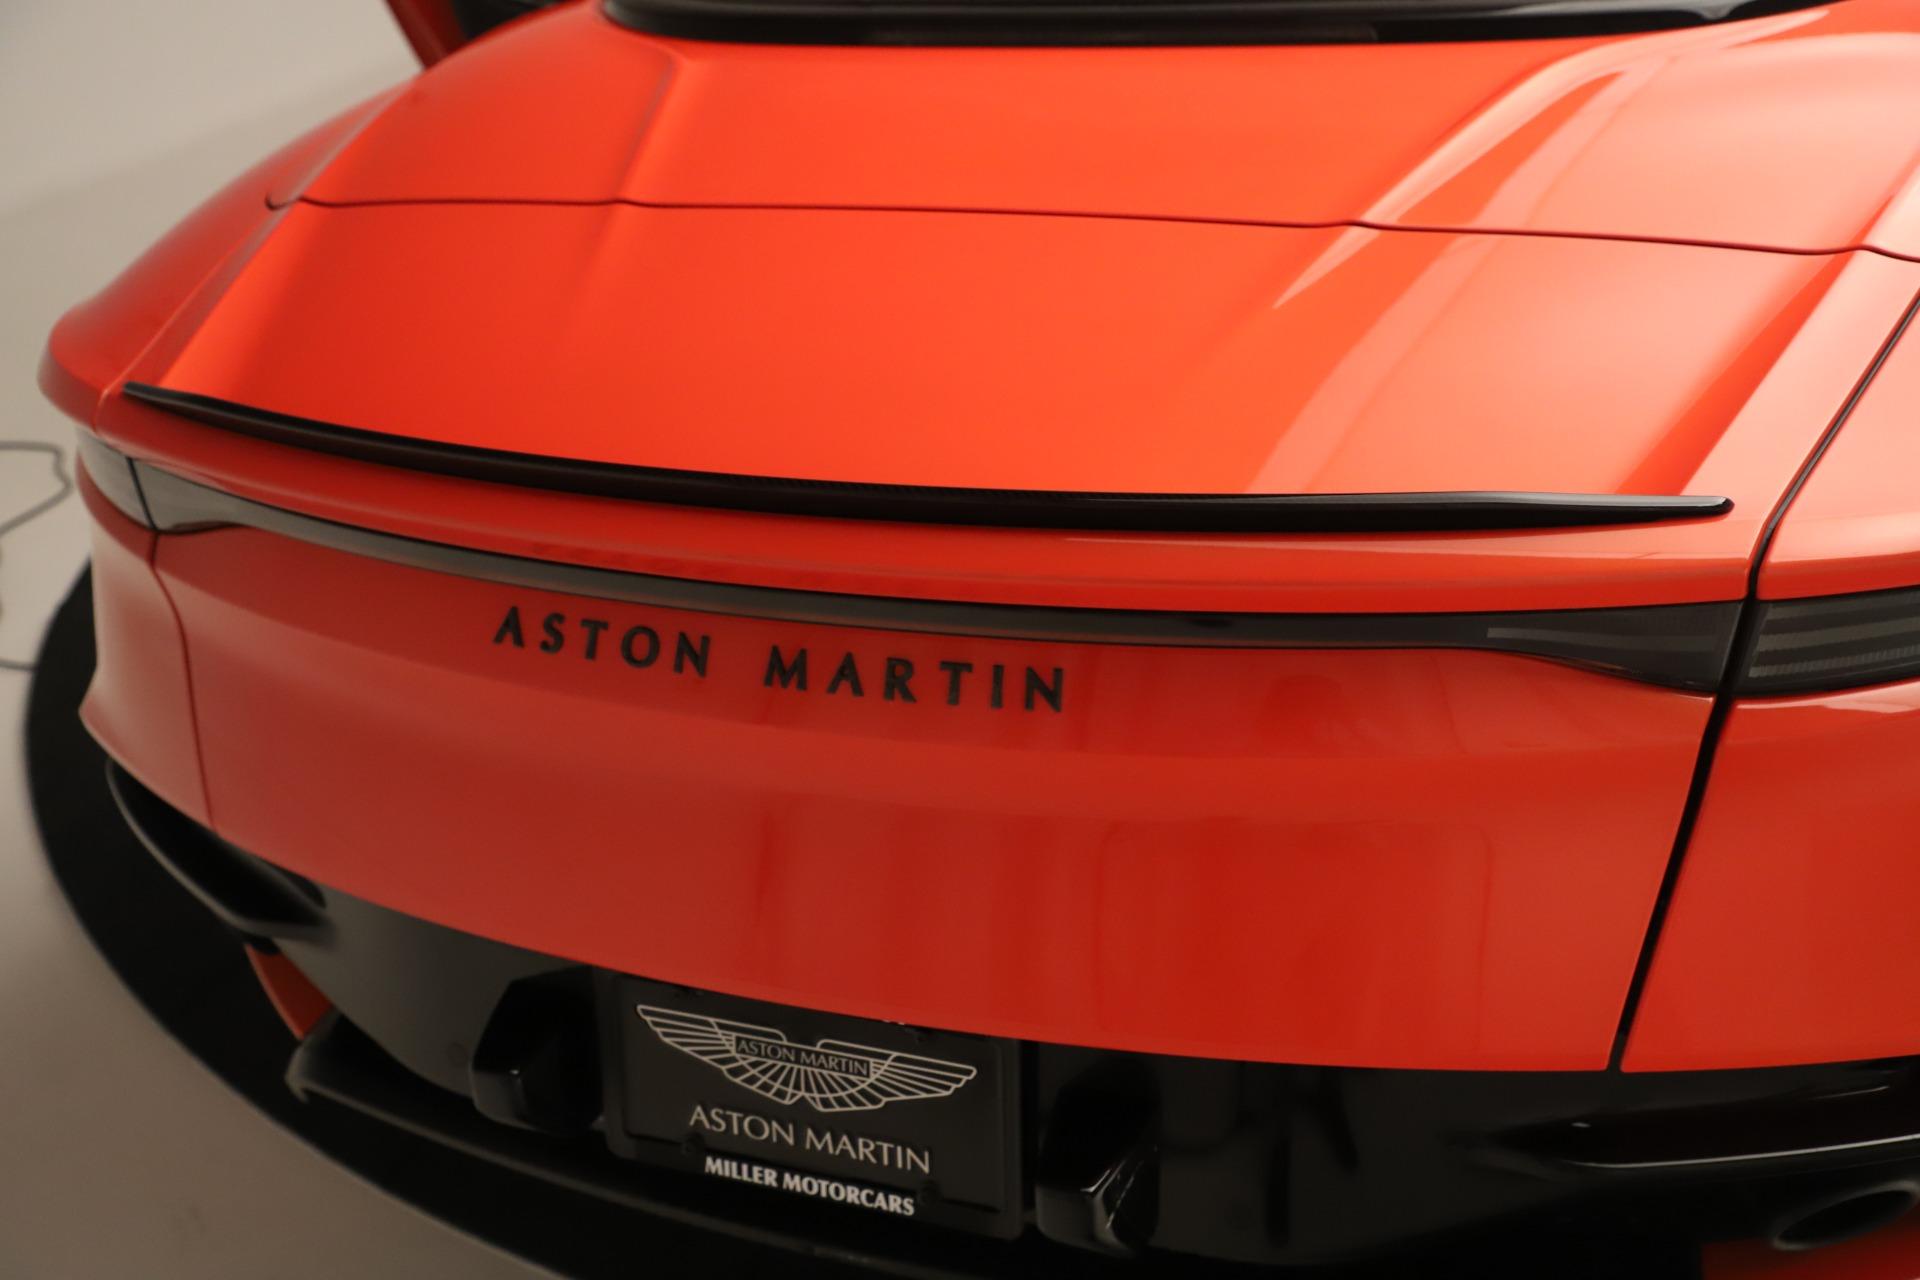 New 2020 Aston Martin DBS Superleggera For Sale In Greenwich, CT 3401_p52